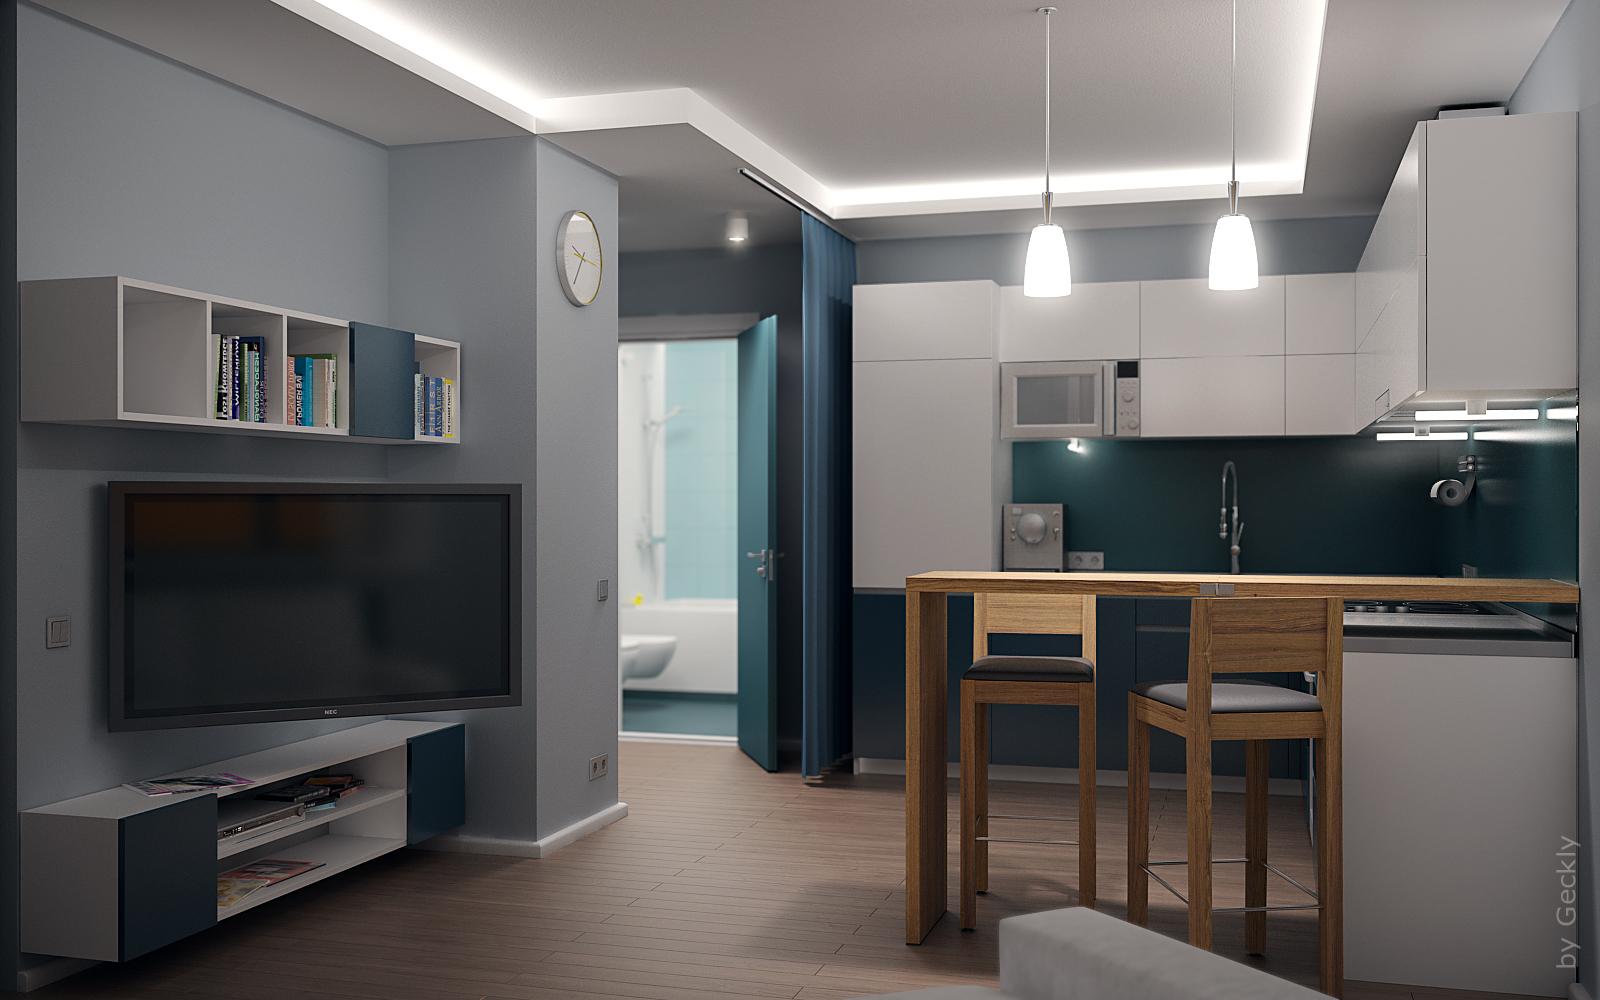 Buy Small Kitchen Appliances Wholesale